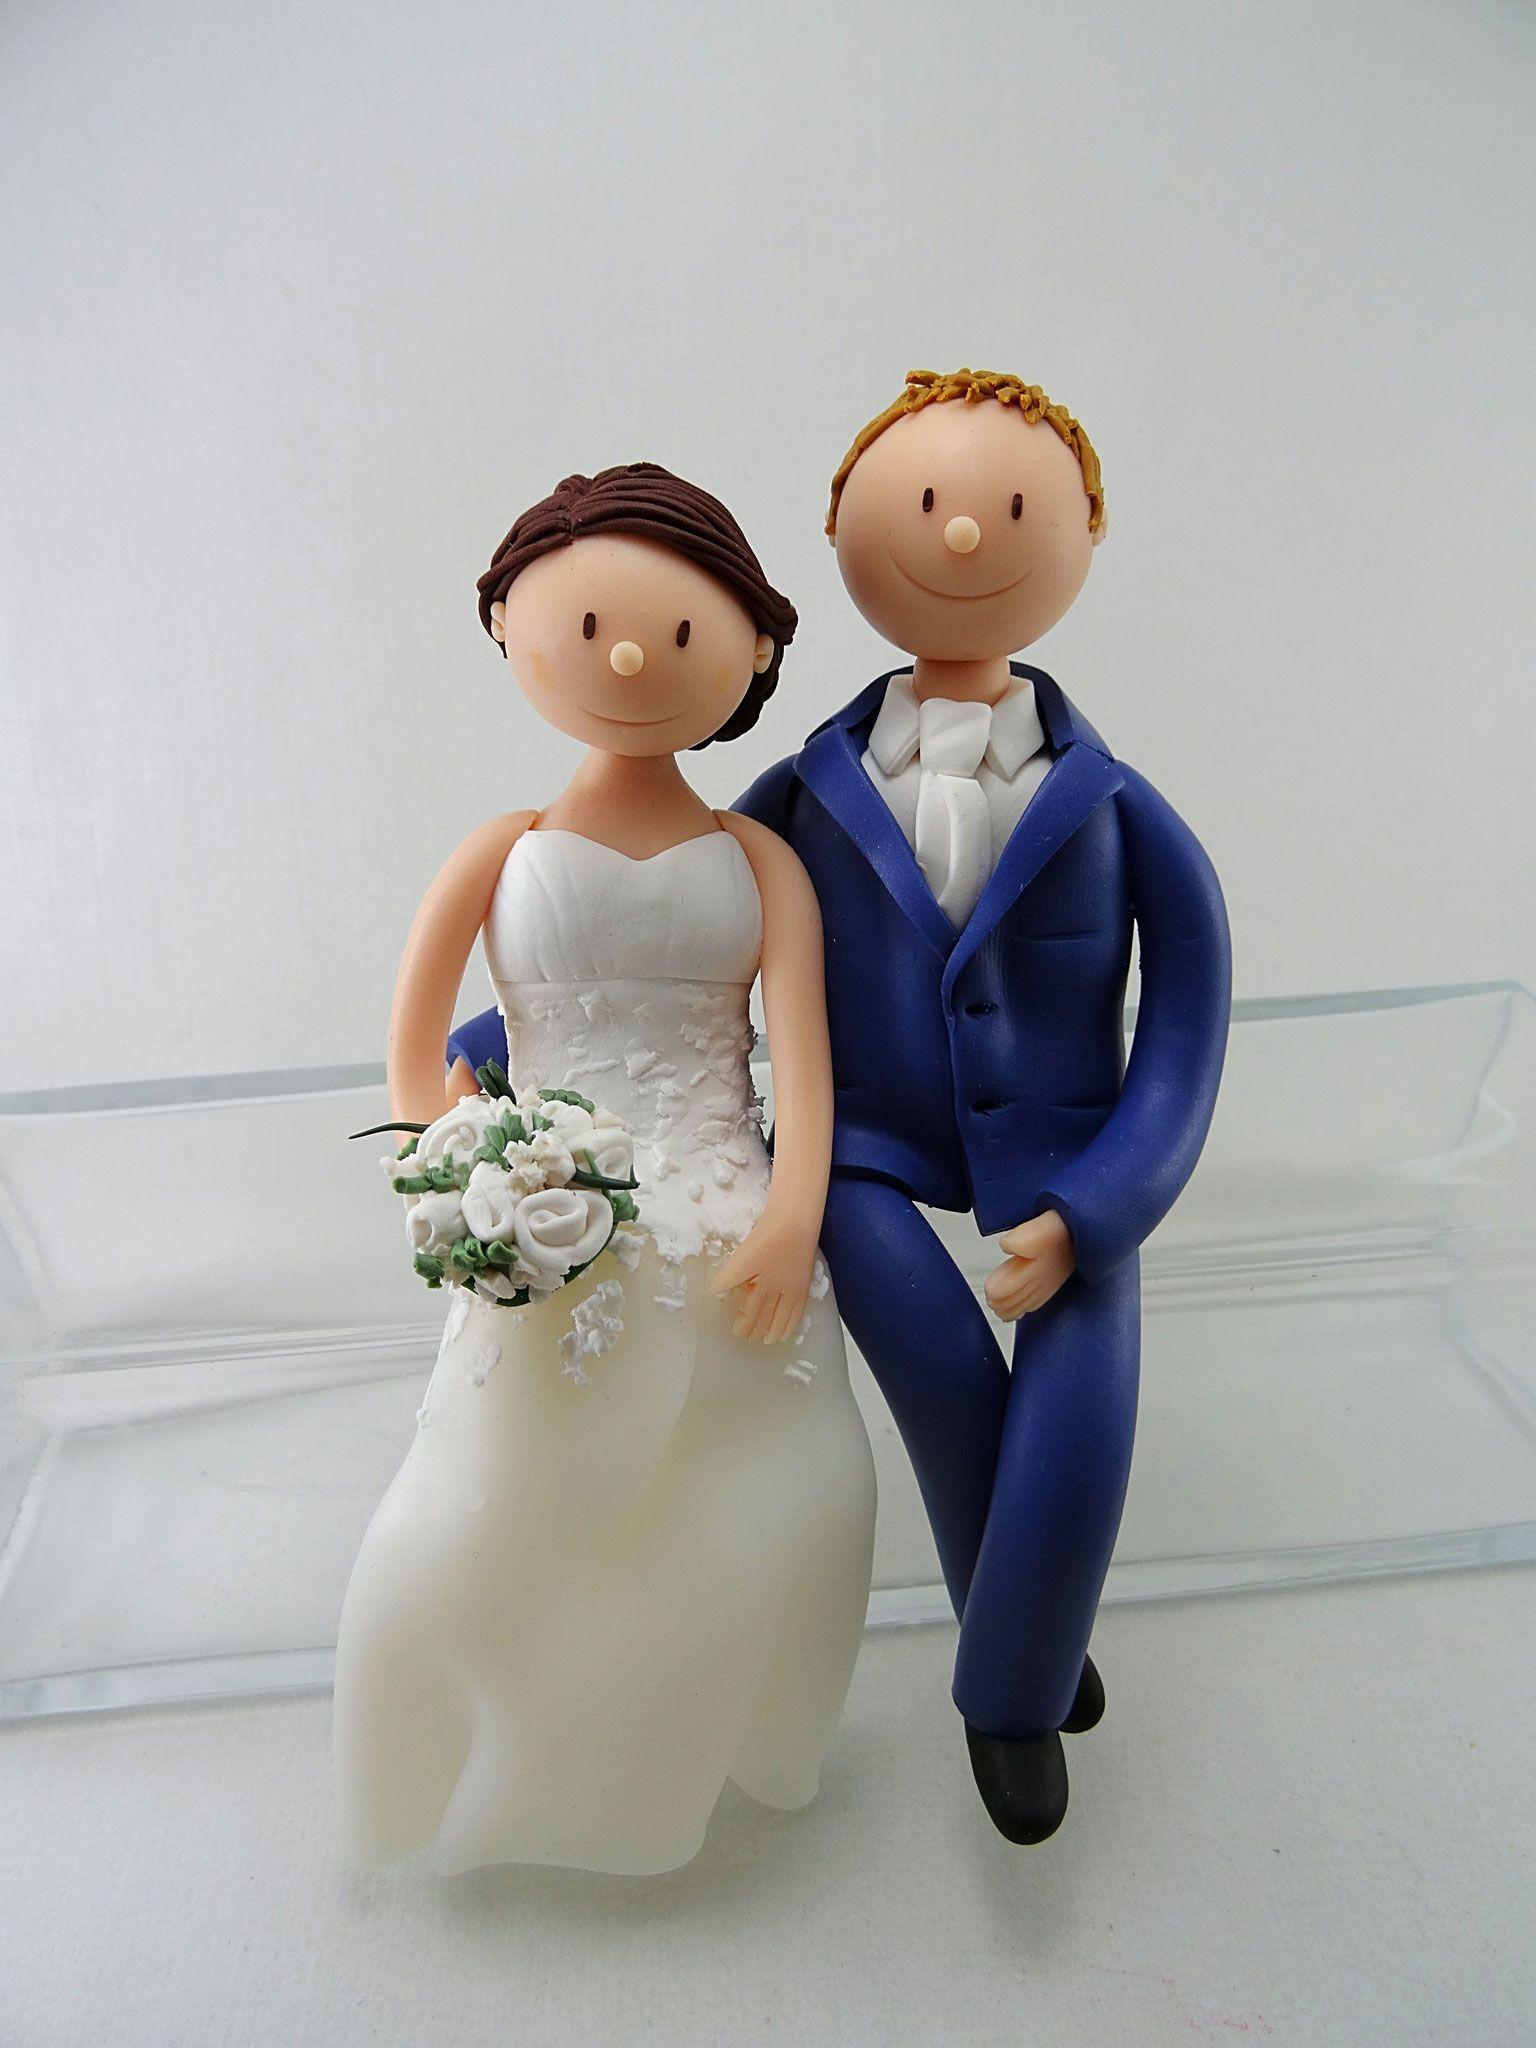 Tortenfigur Brautpaar Sitzend Tortenfiguren Hochzeit Torten Figuren Tortenfiguren